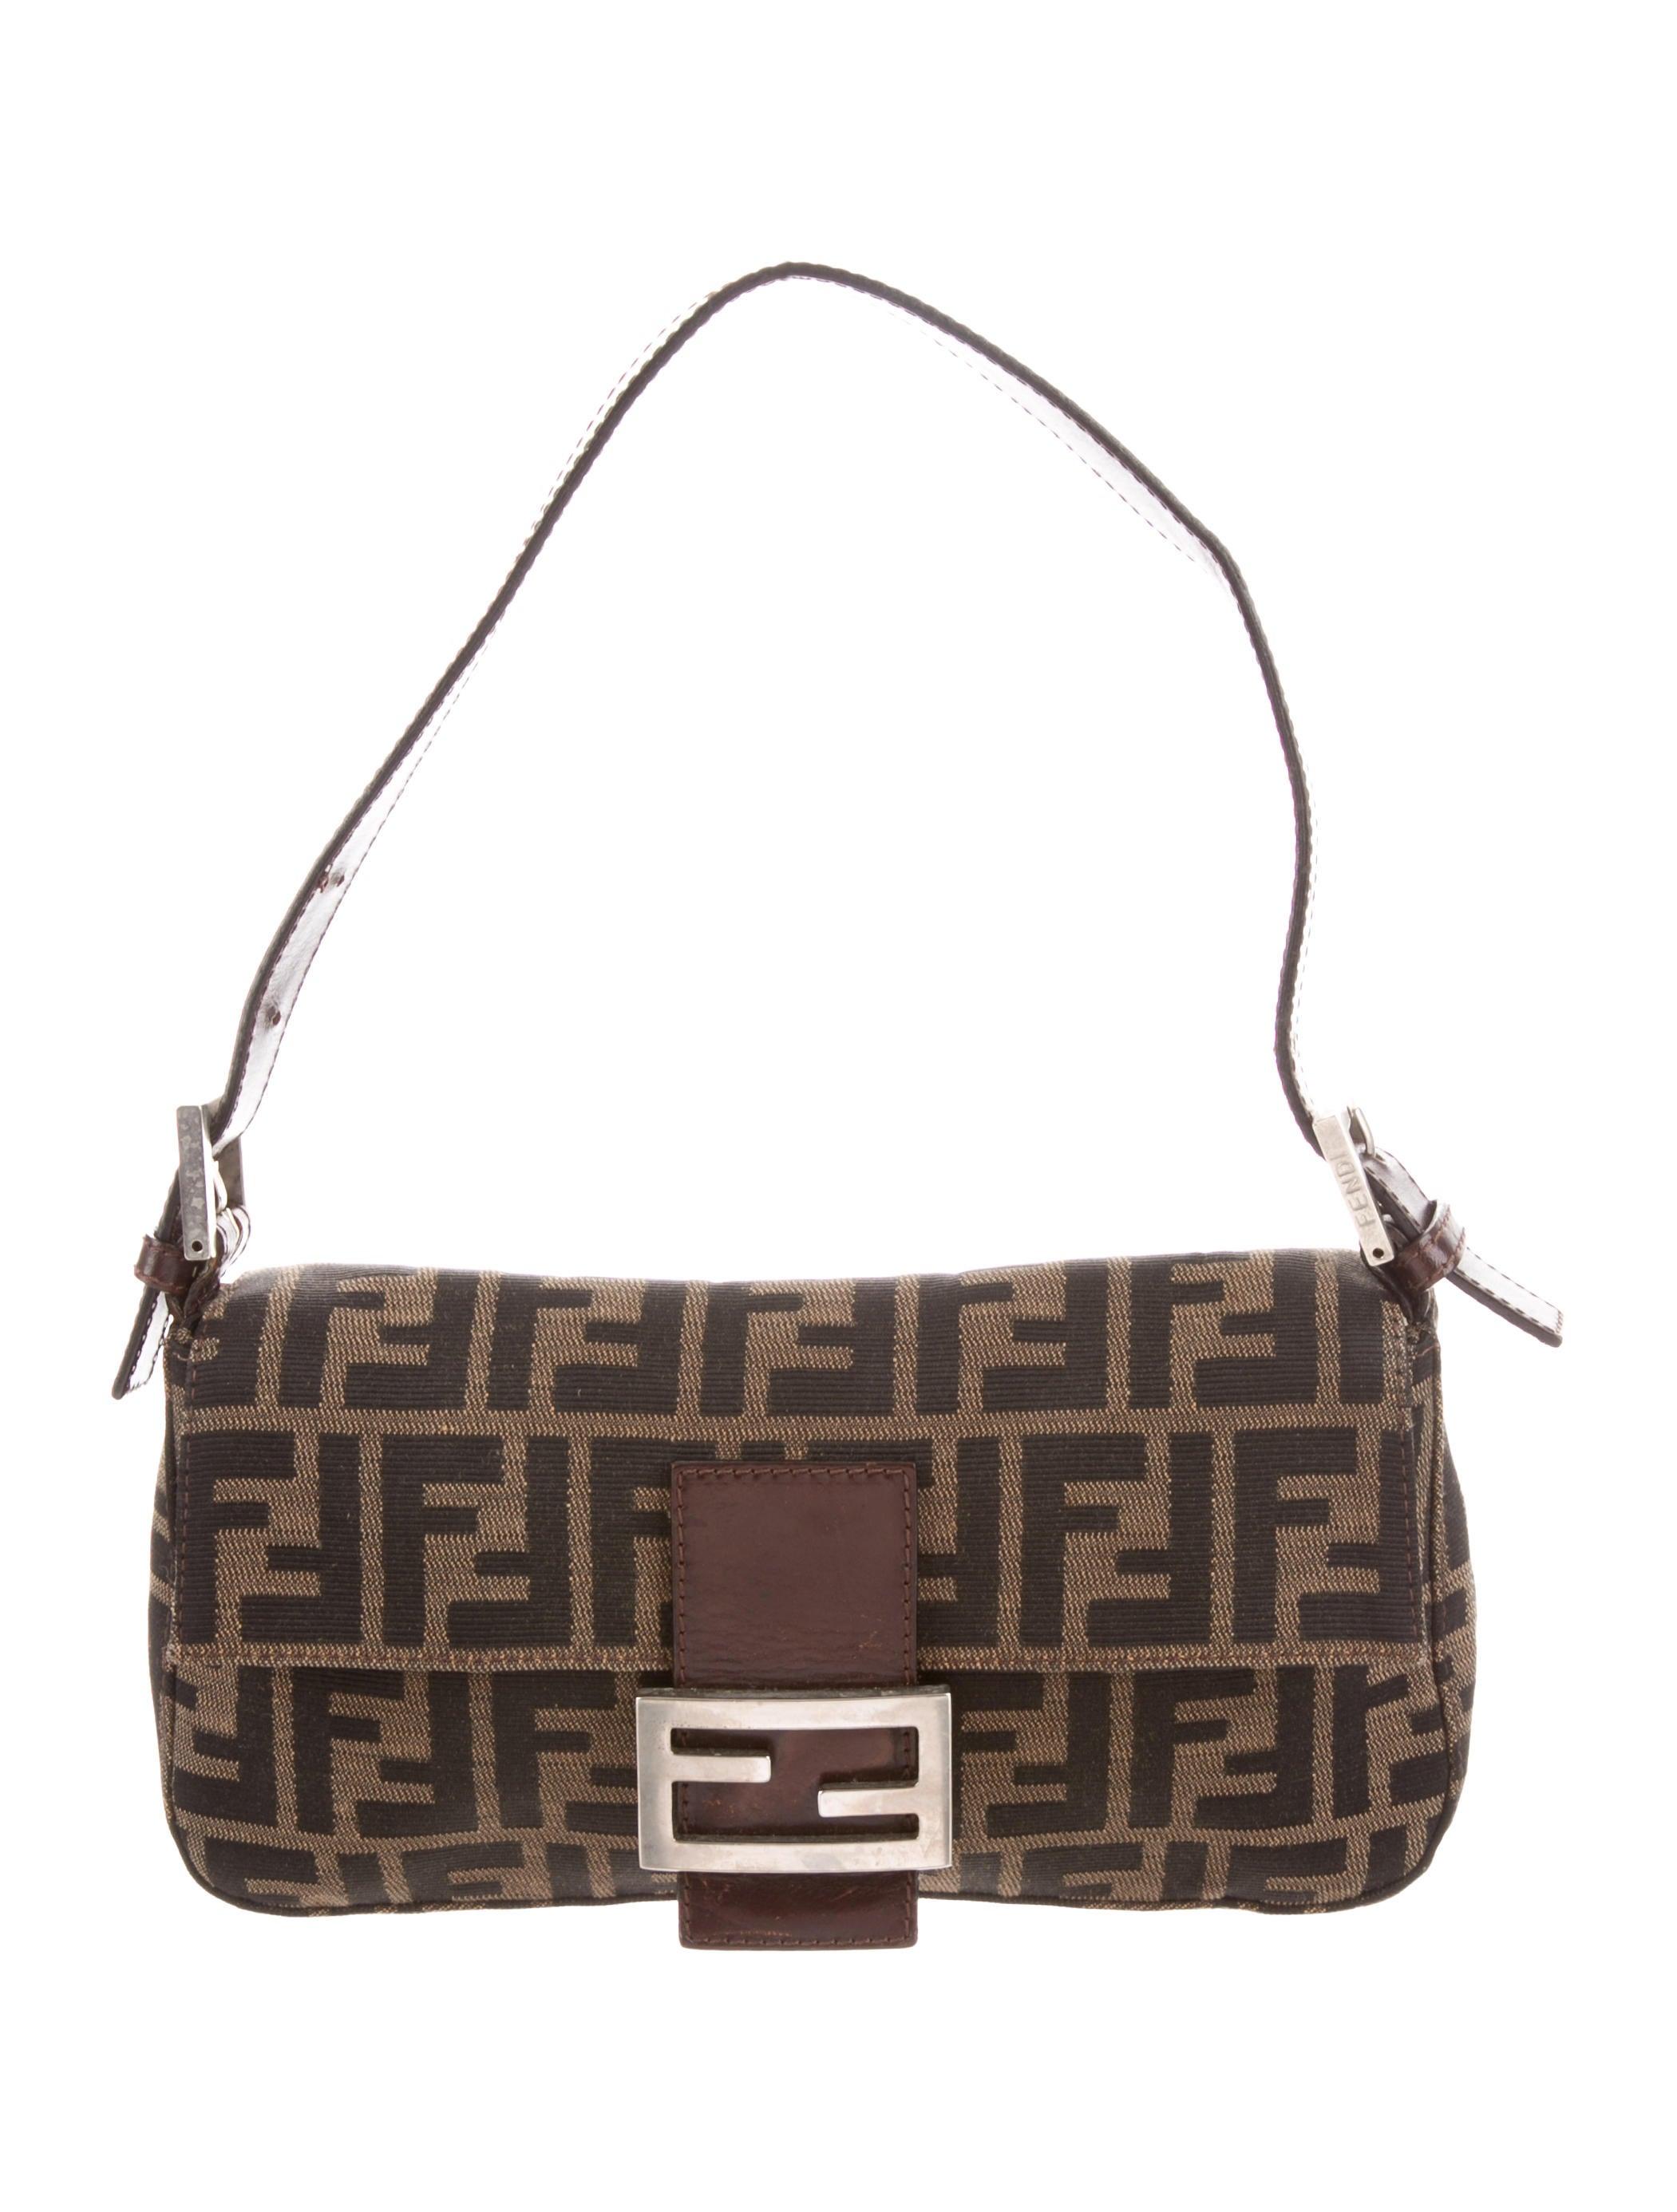 5bc5d29752e7 Fendi Zucca Baguette Bag - Handbags - FEN83294